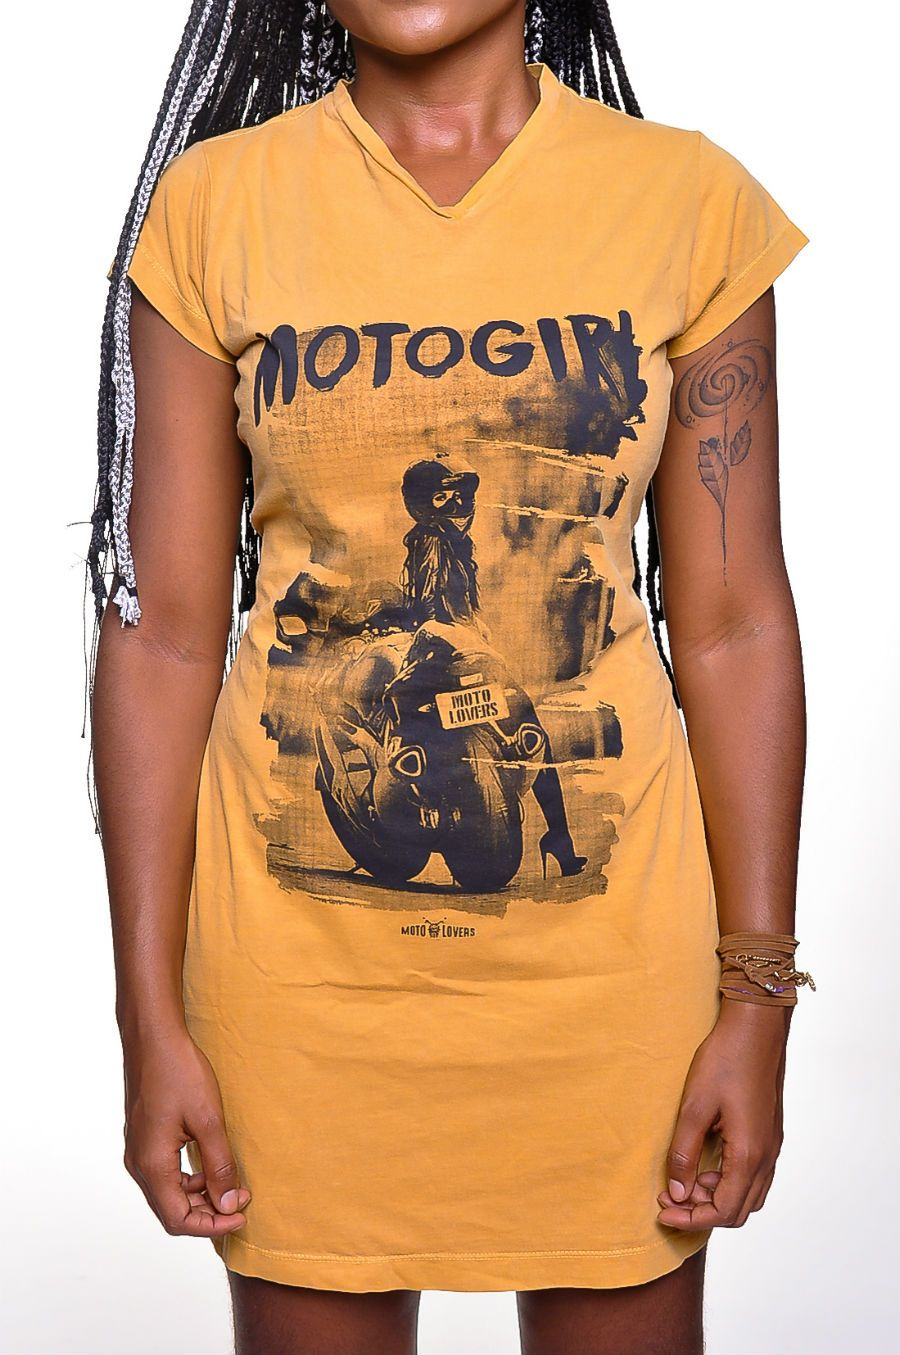 Vestido Moto Lovers - Moto Girl